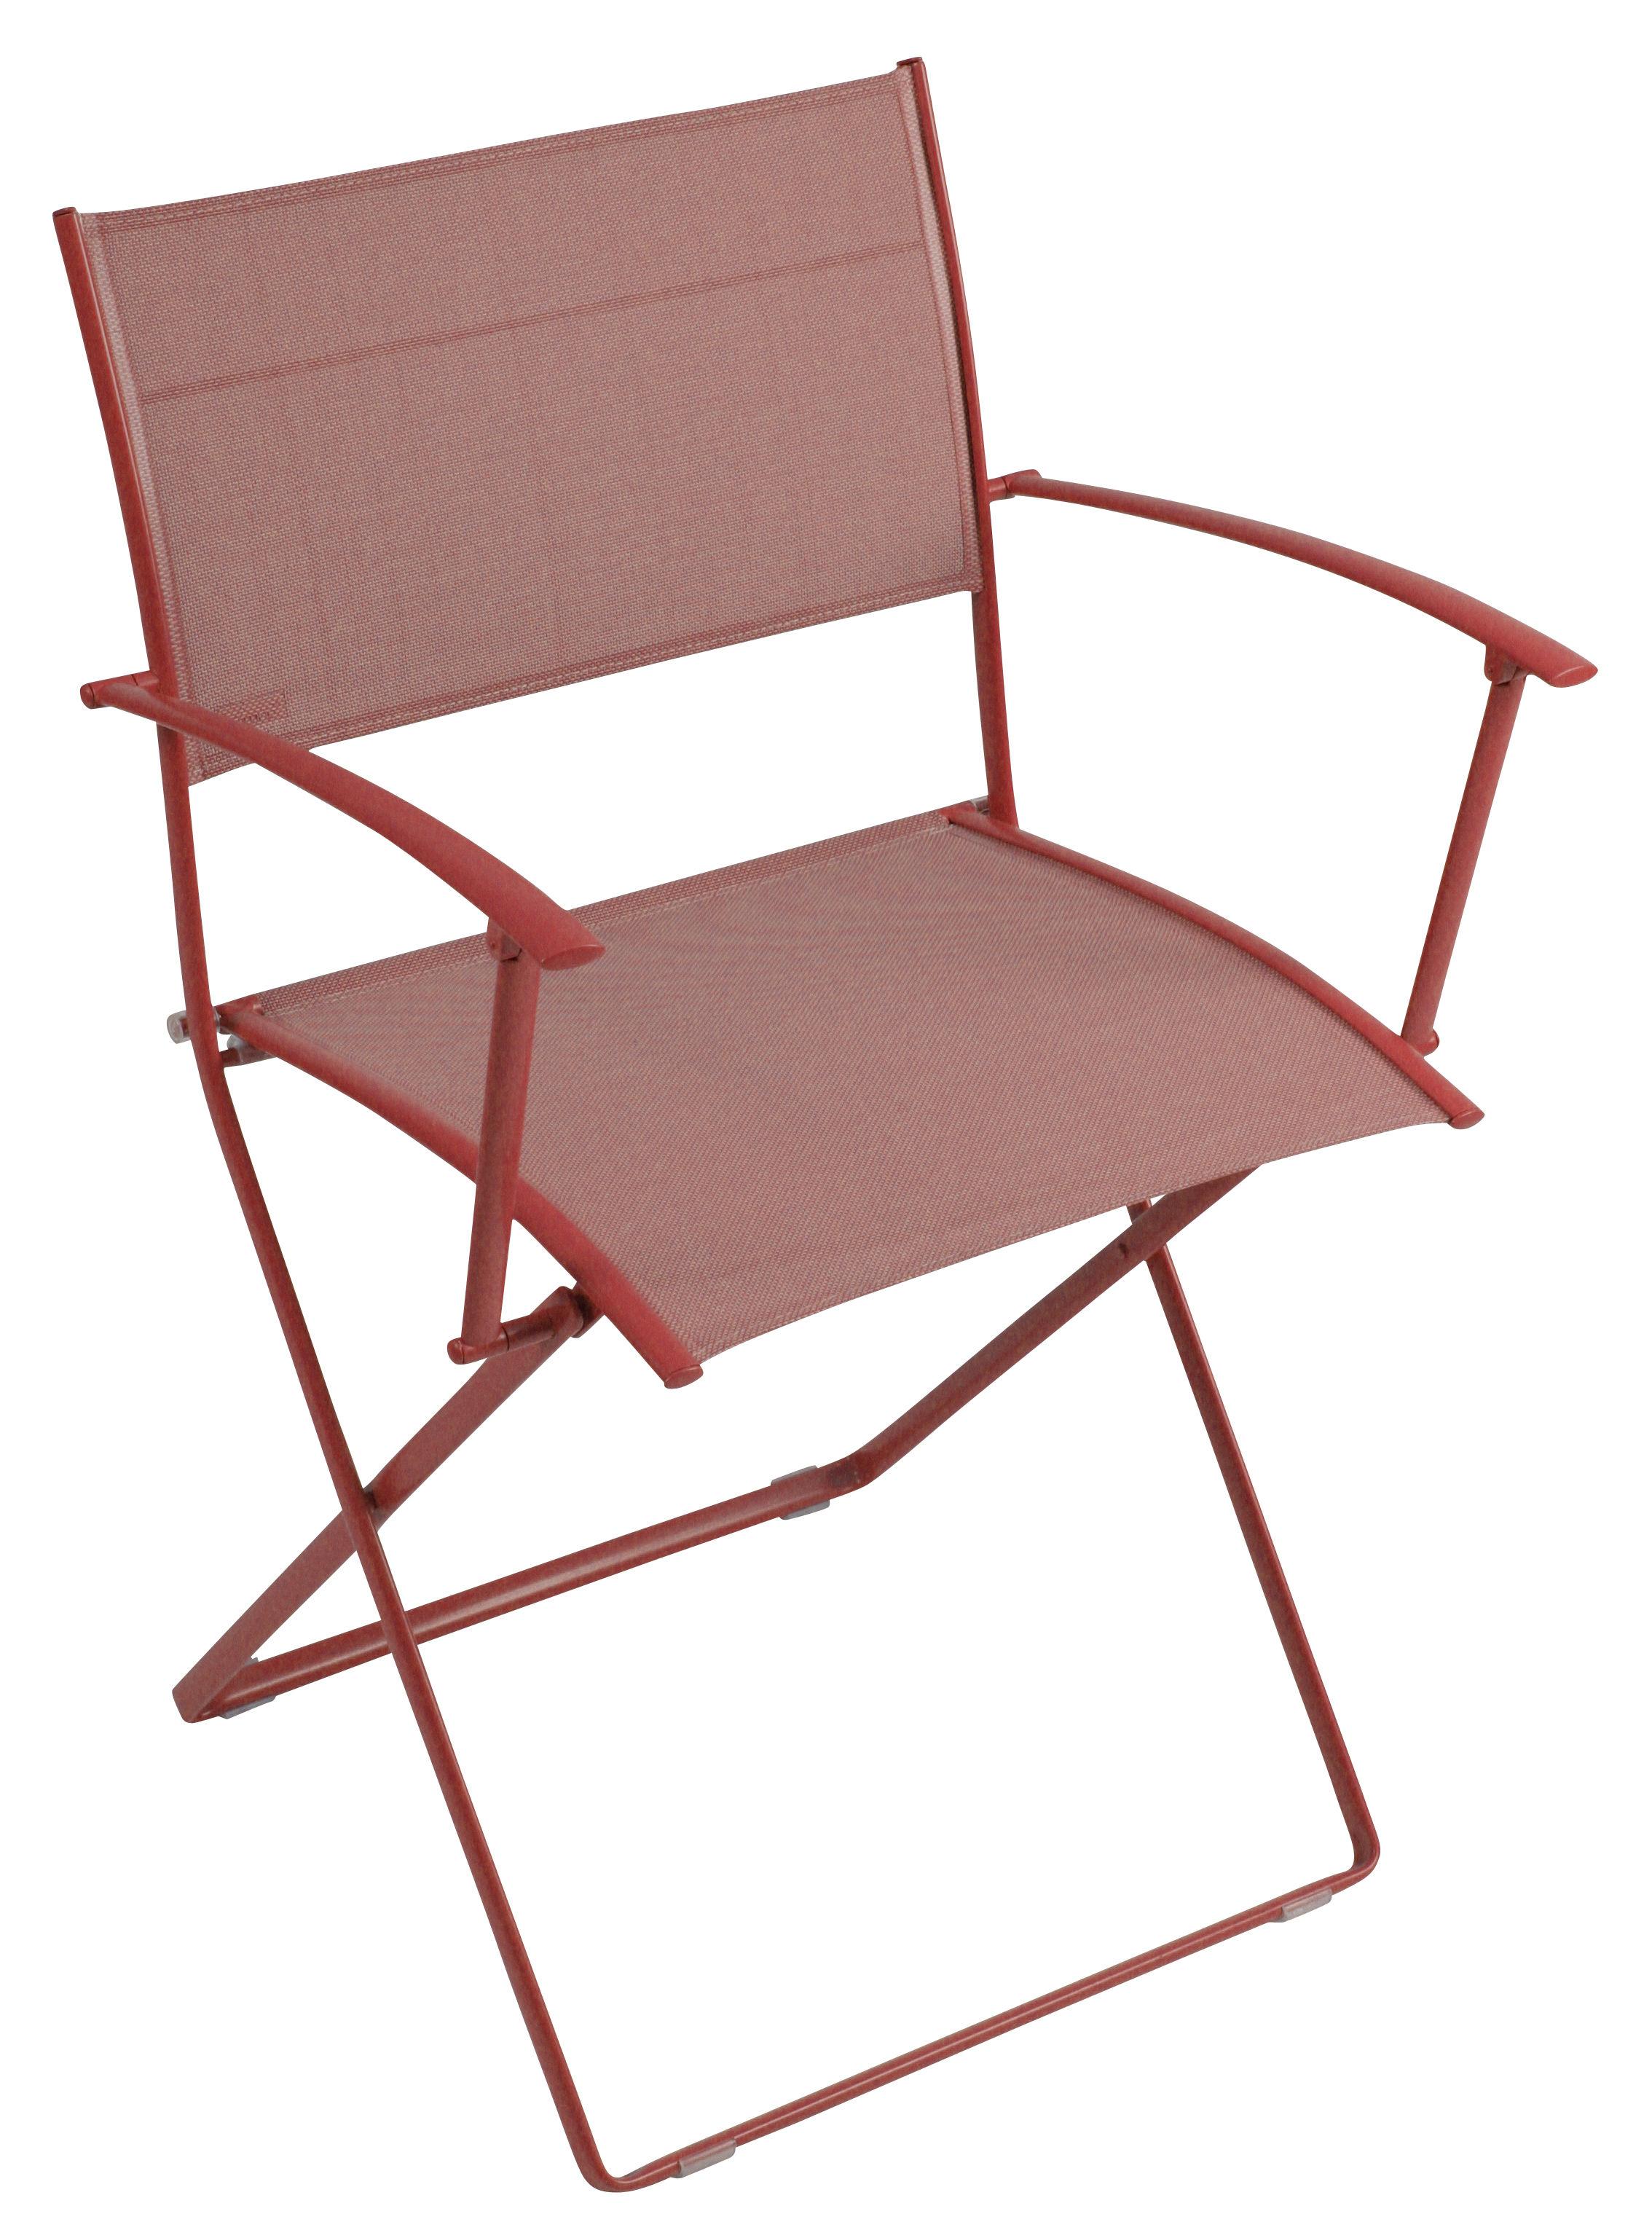 fauteuil pliant plein air toile coquelicot fermob. Black Bedroom Furniture Sets. Home Design Ideas